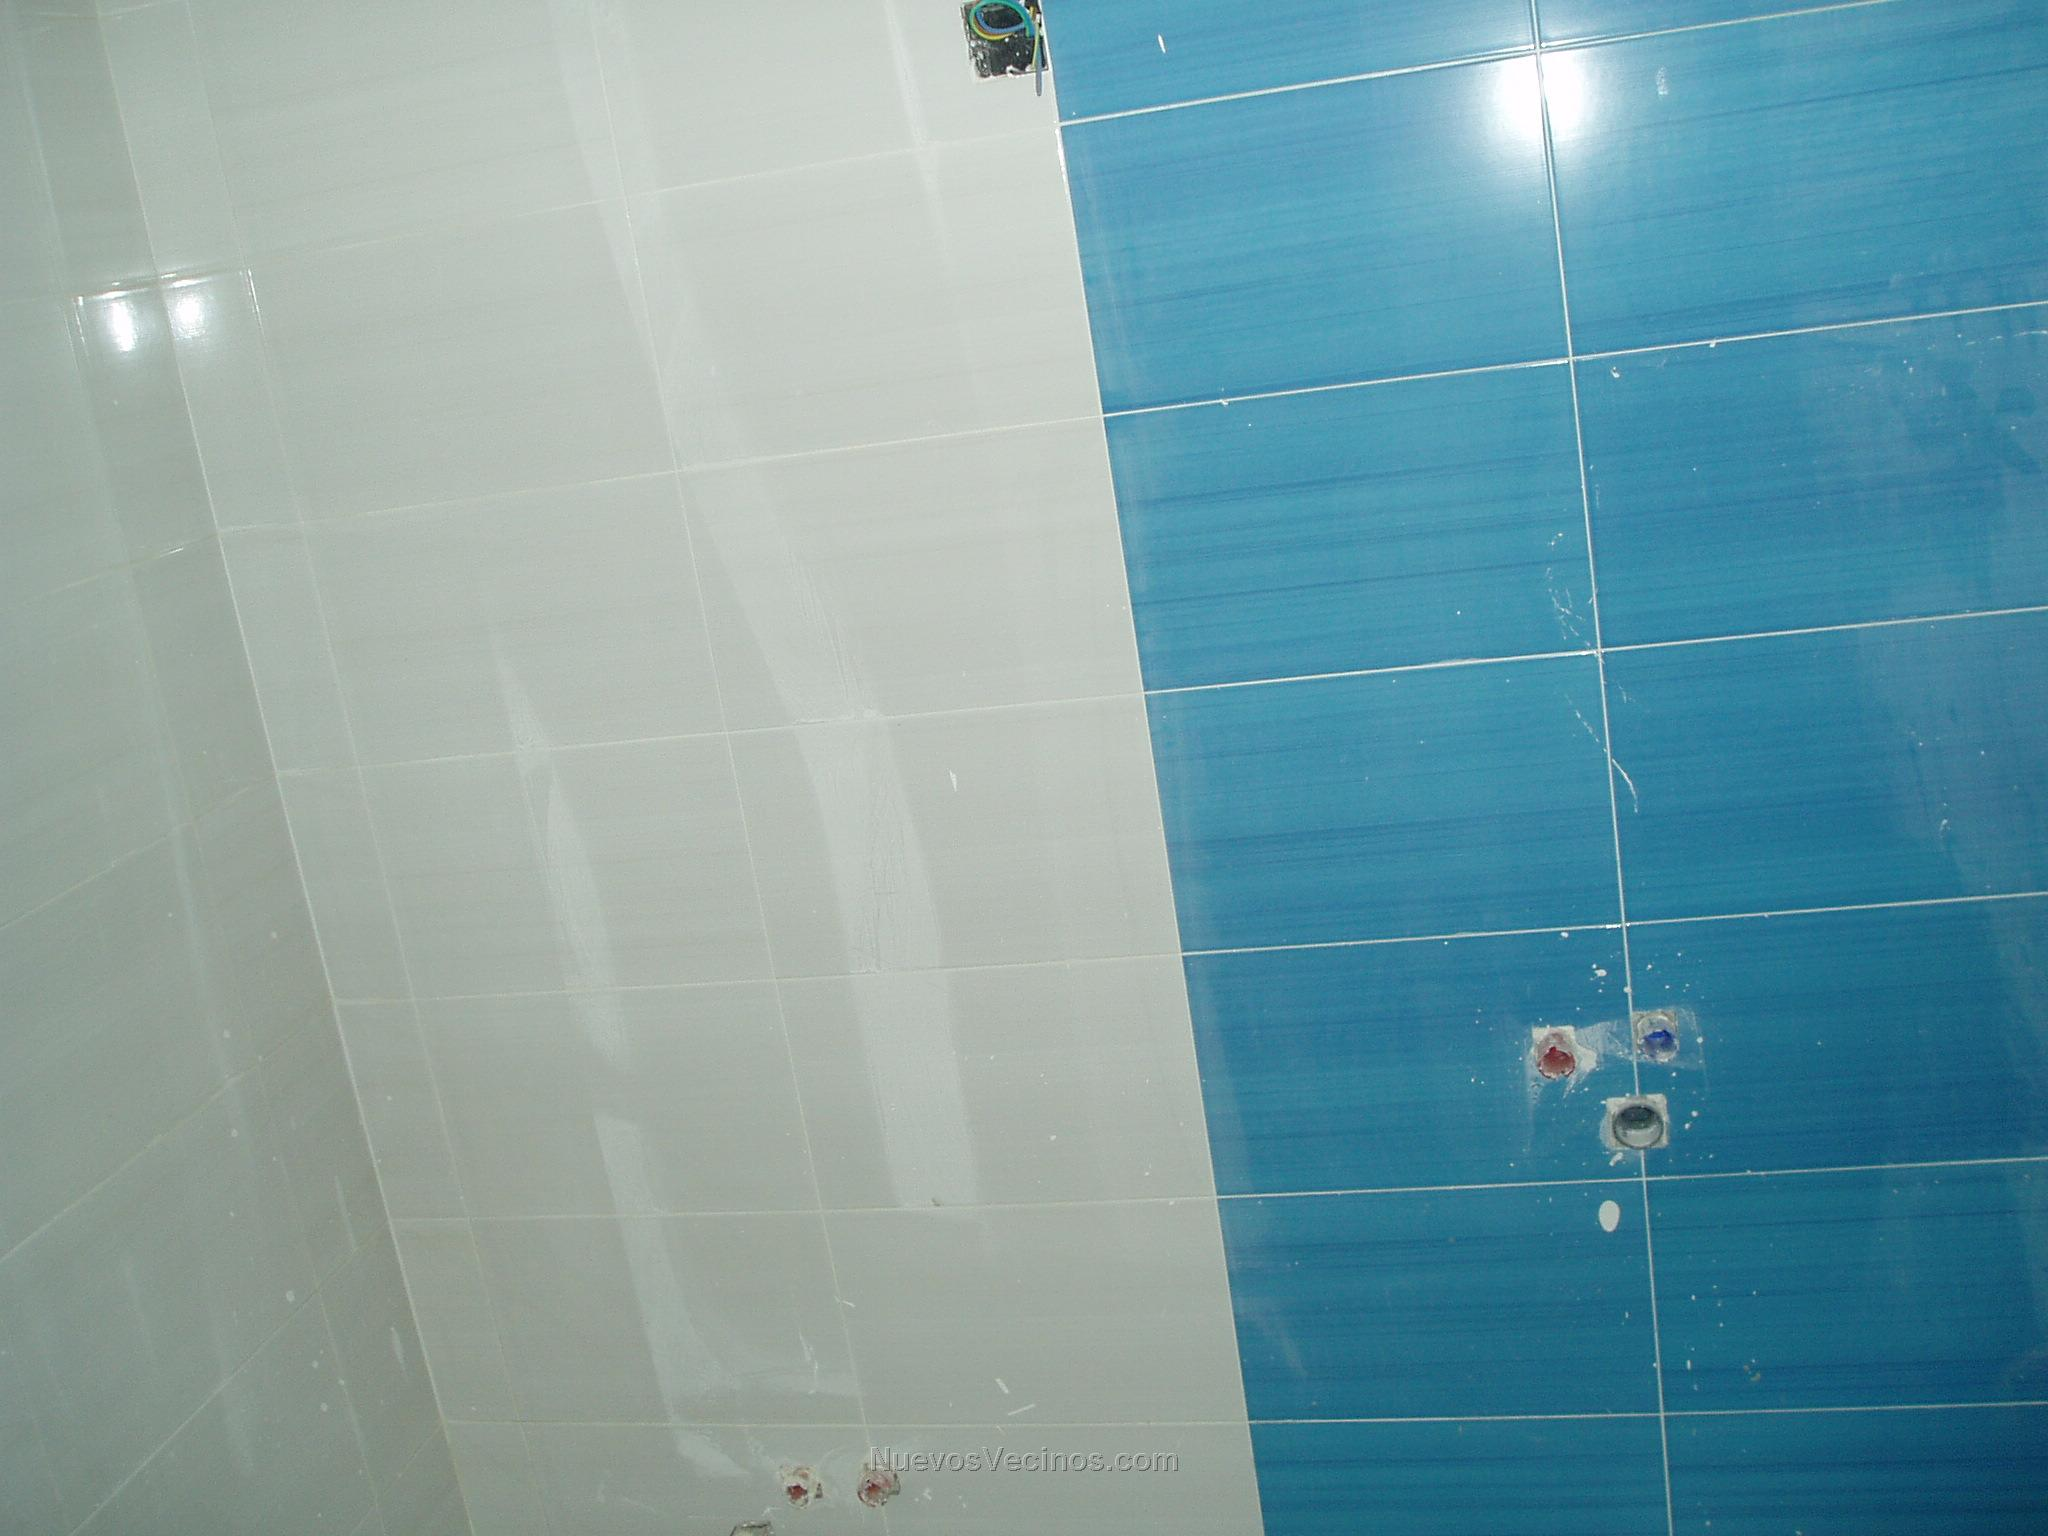 azulejos bao segurola escandalera fotos azulejos de bao with pintar azulejos bao